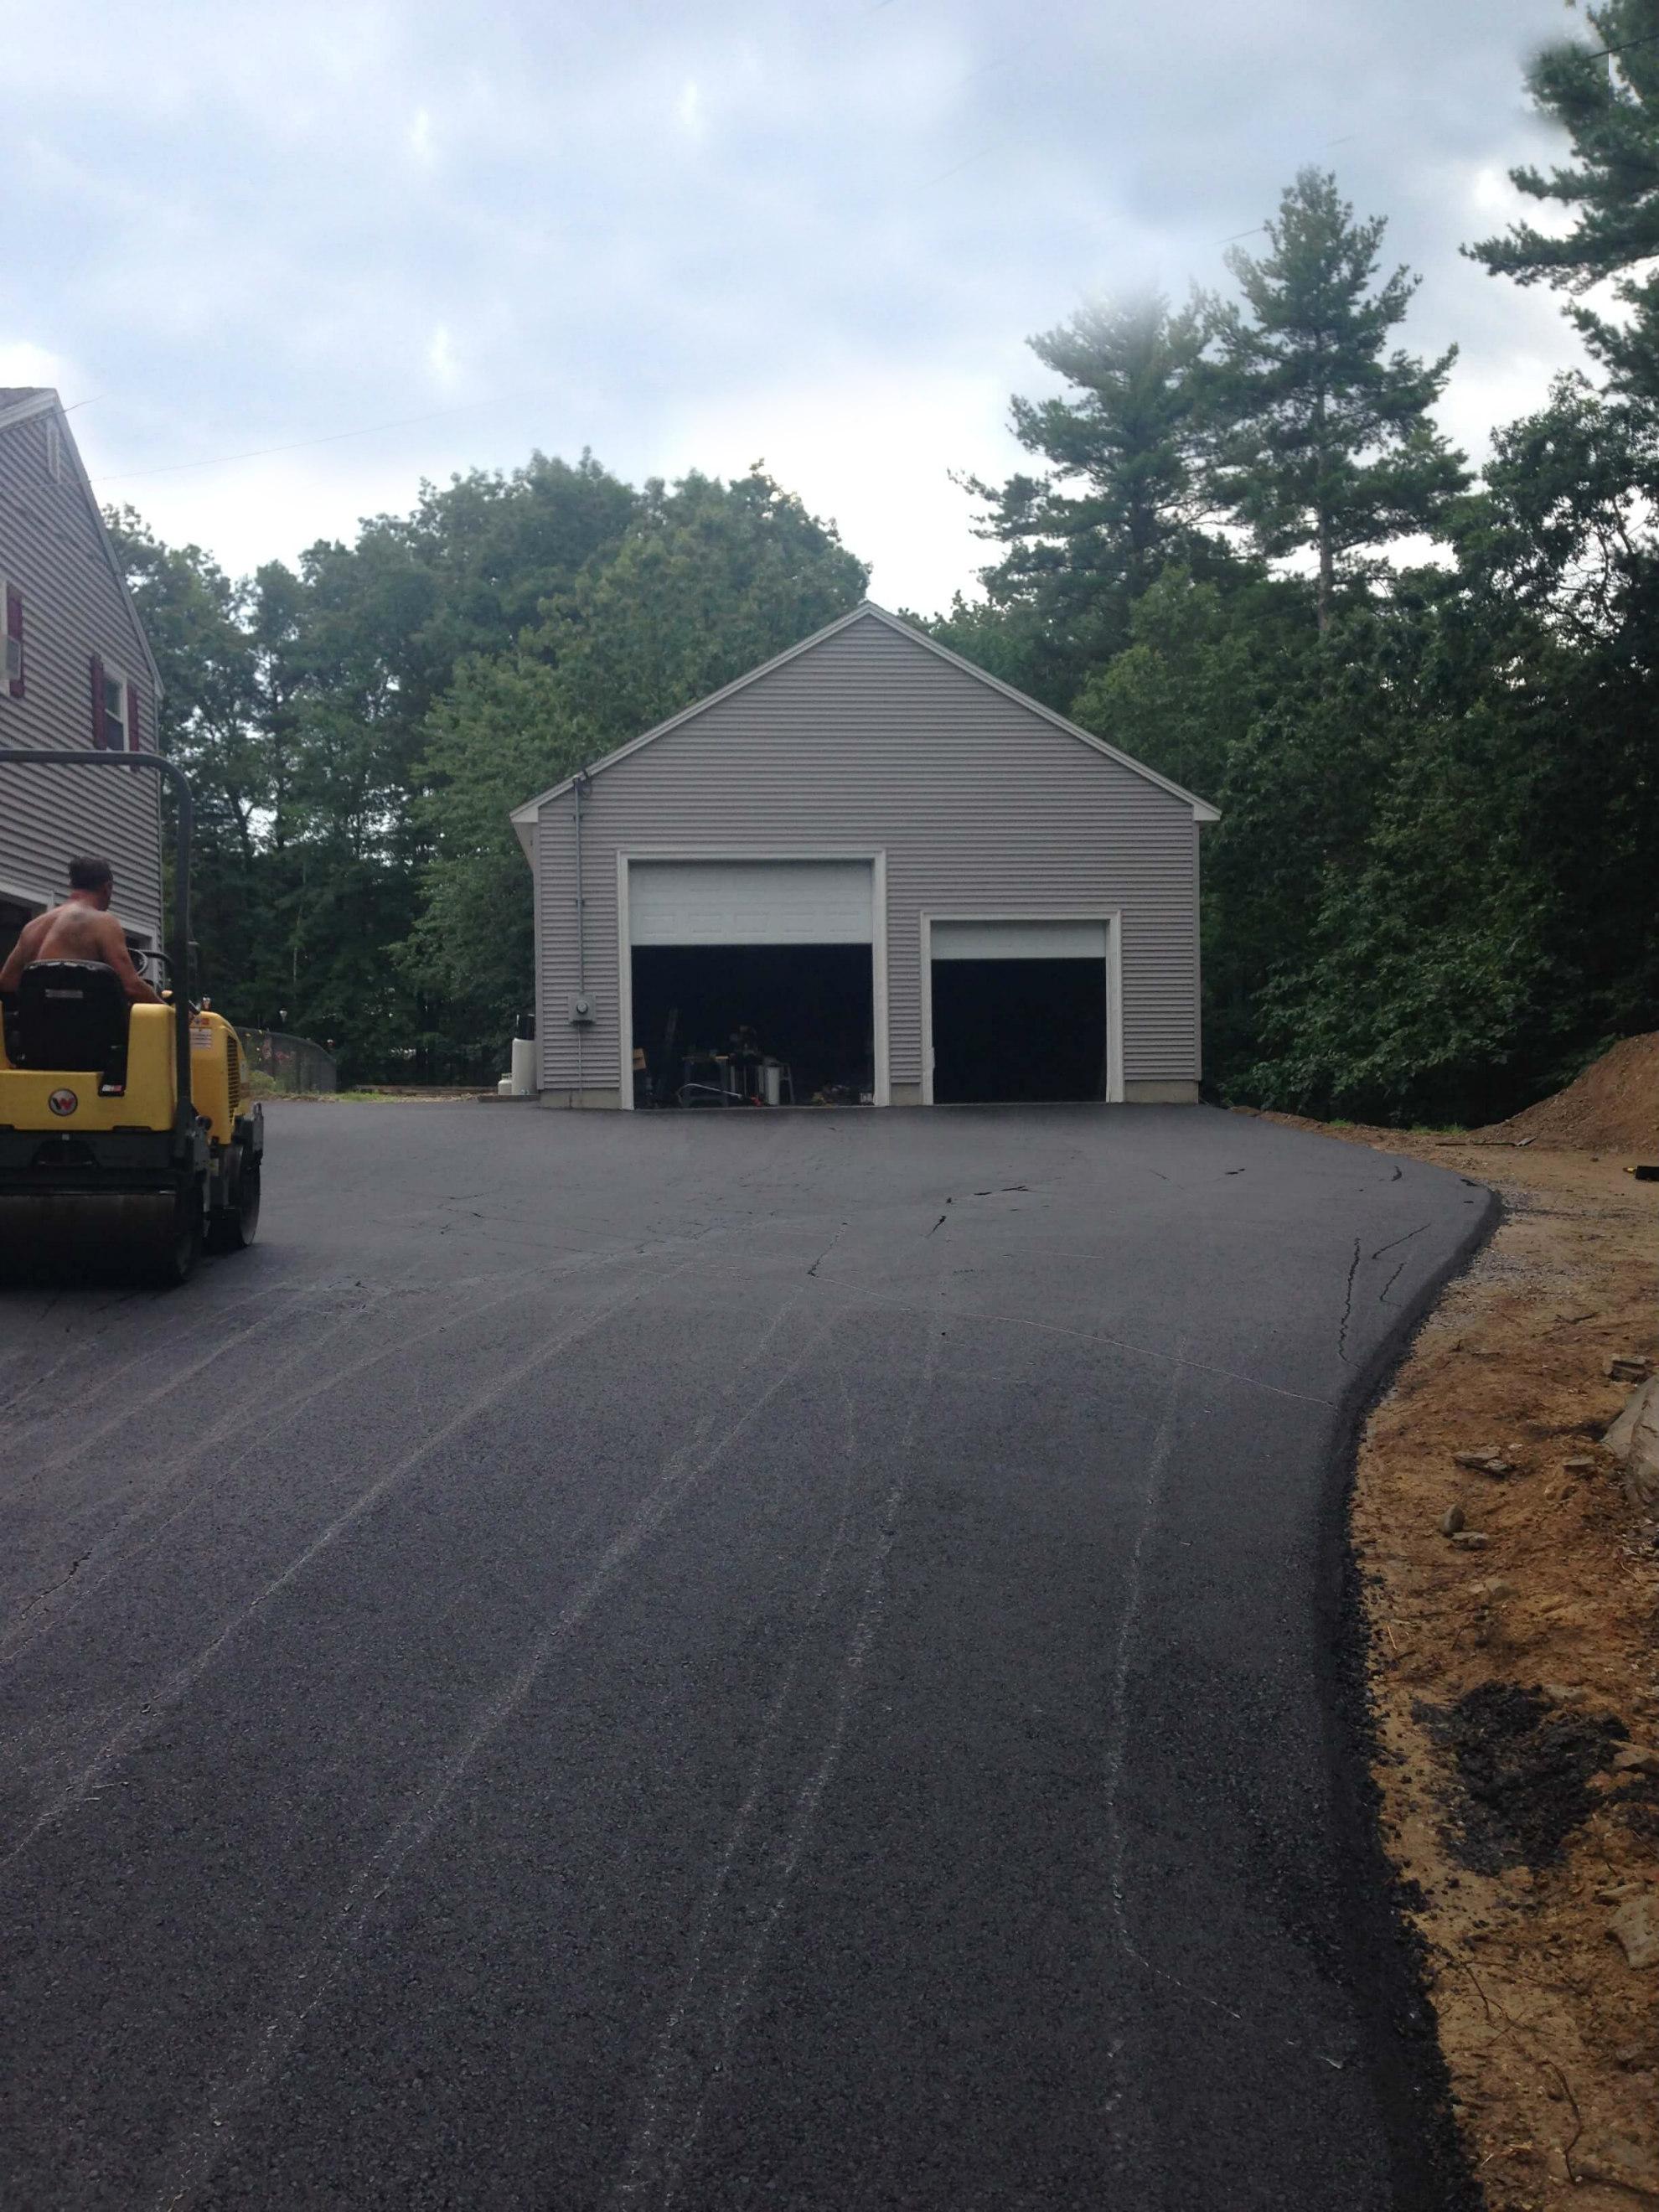 asphalt driveway - no wires